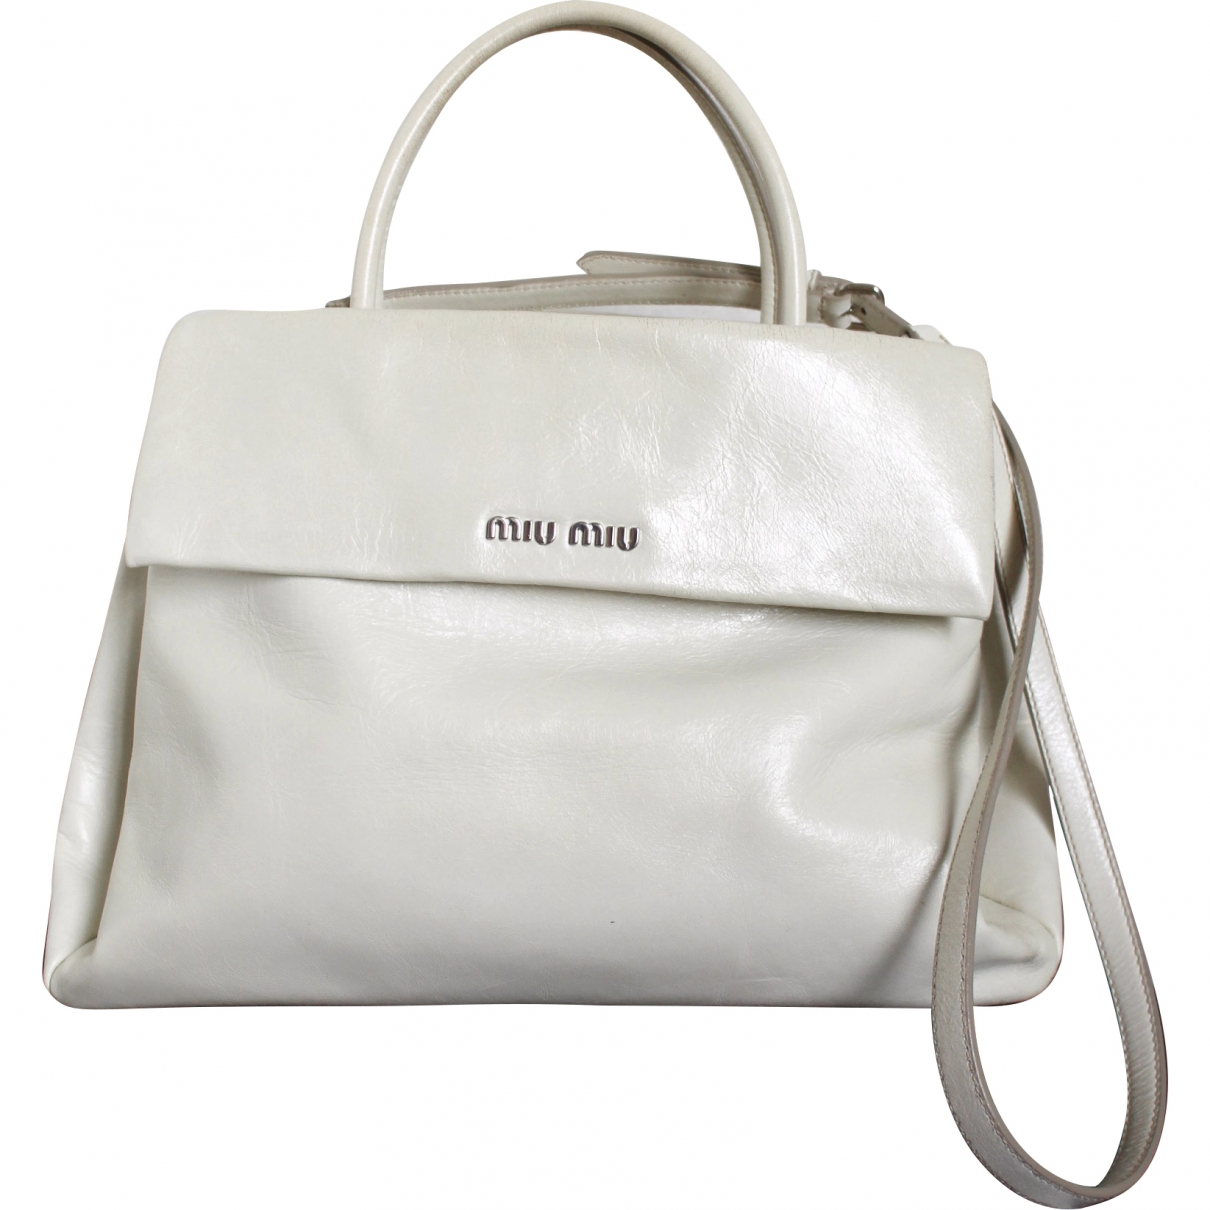 Miu Miu \N White Patent leather handbag for Women \N